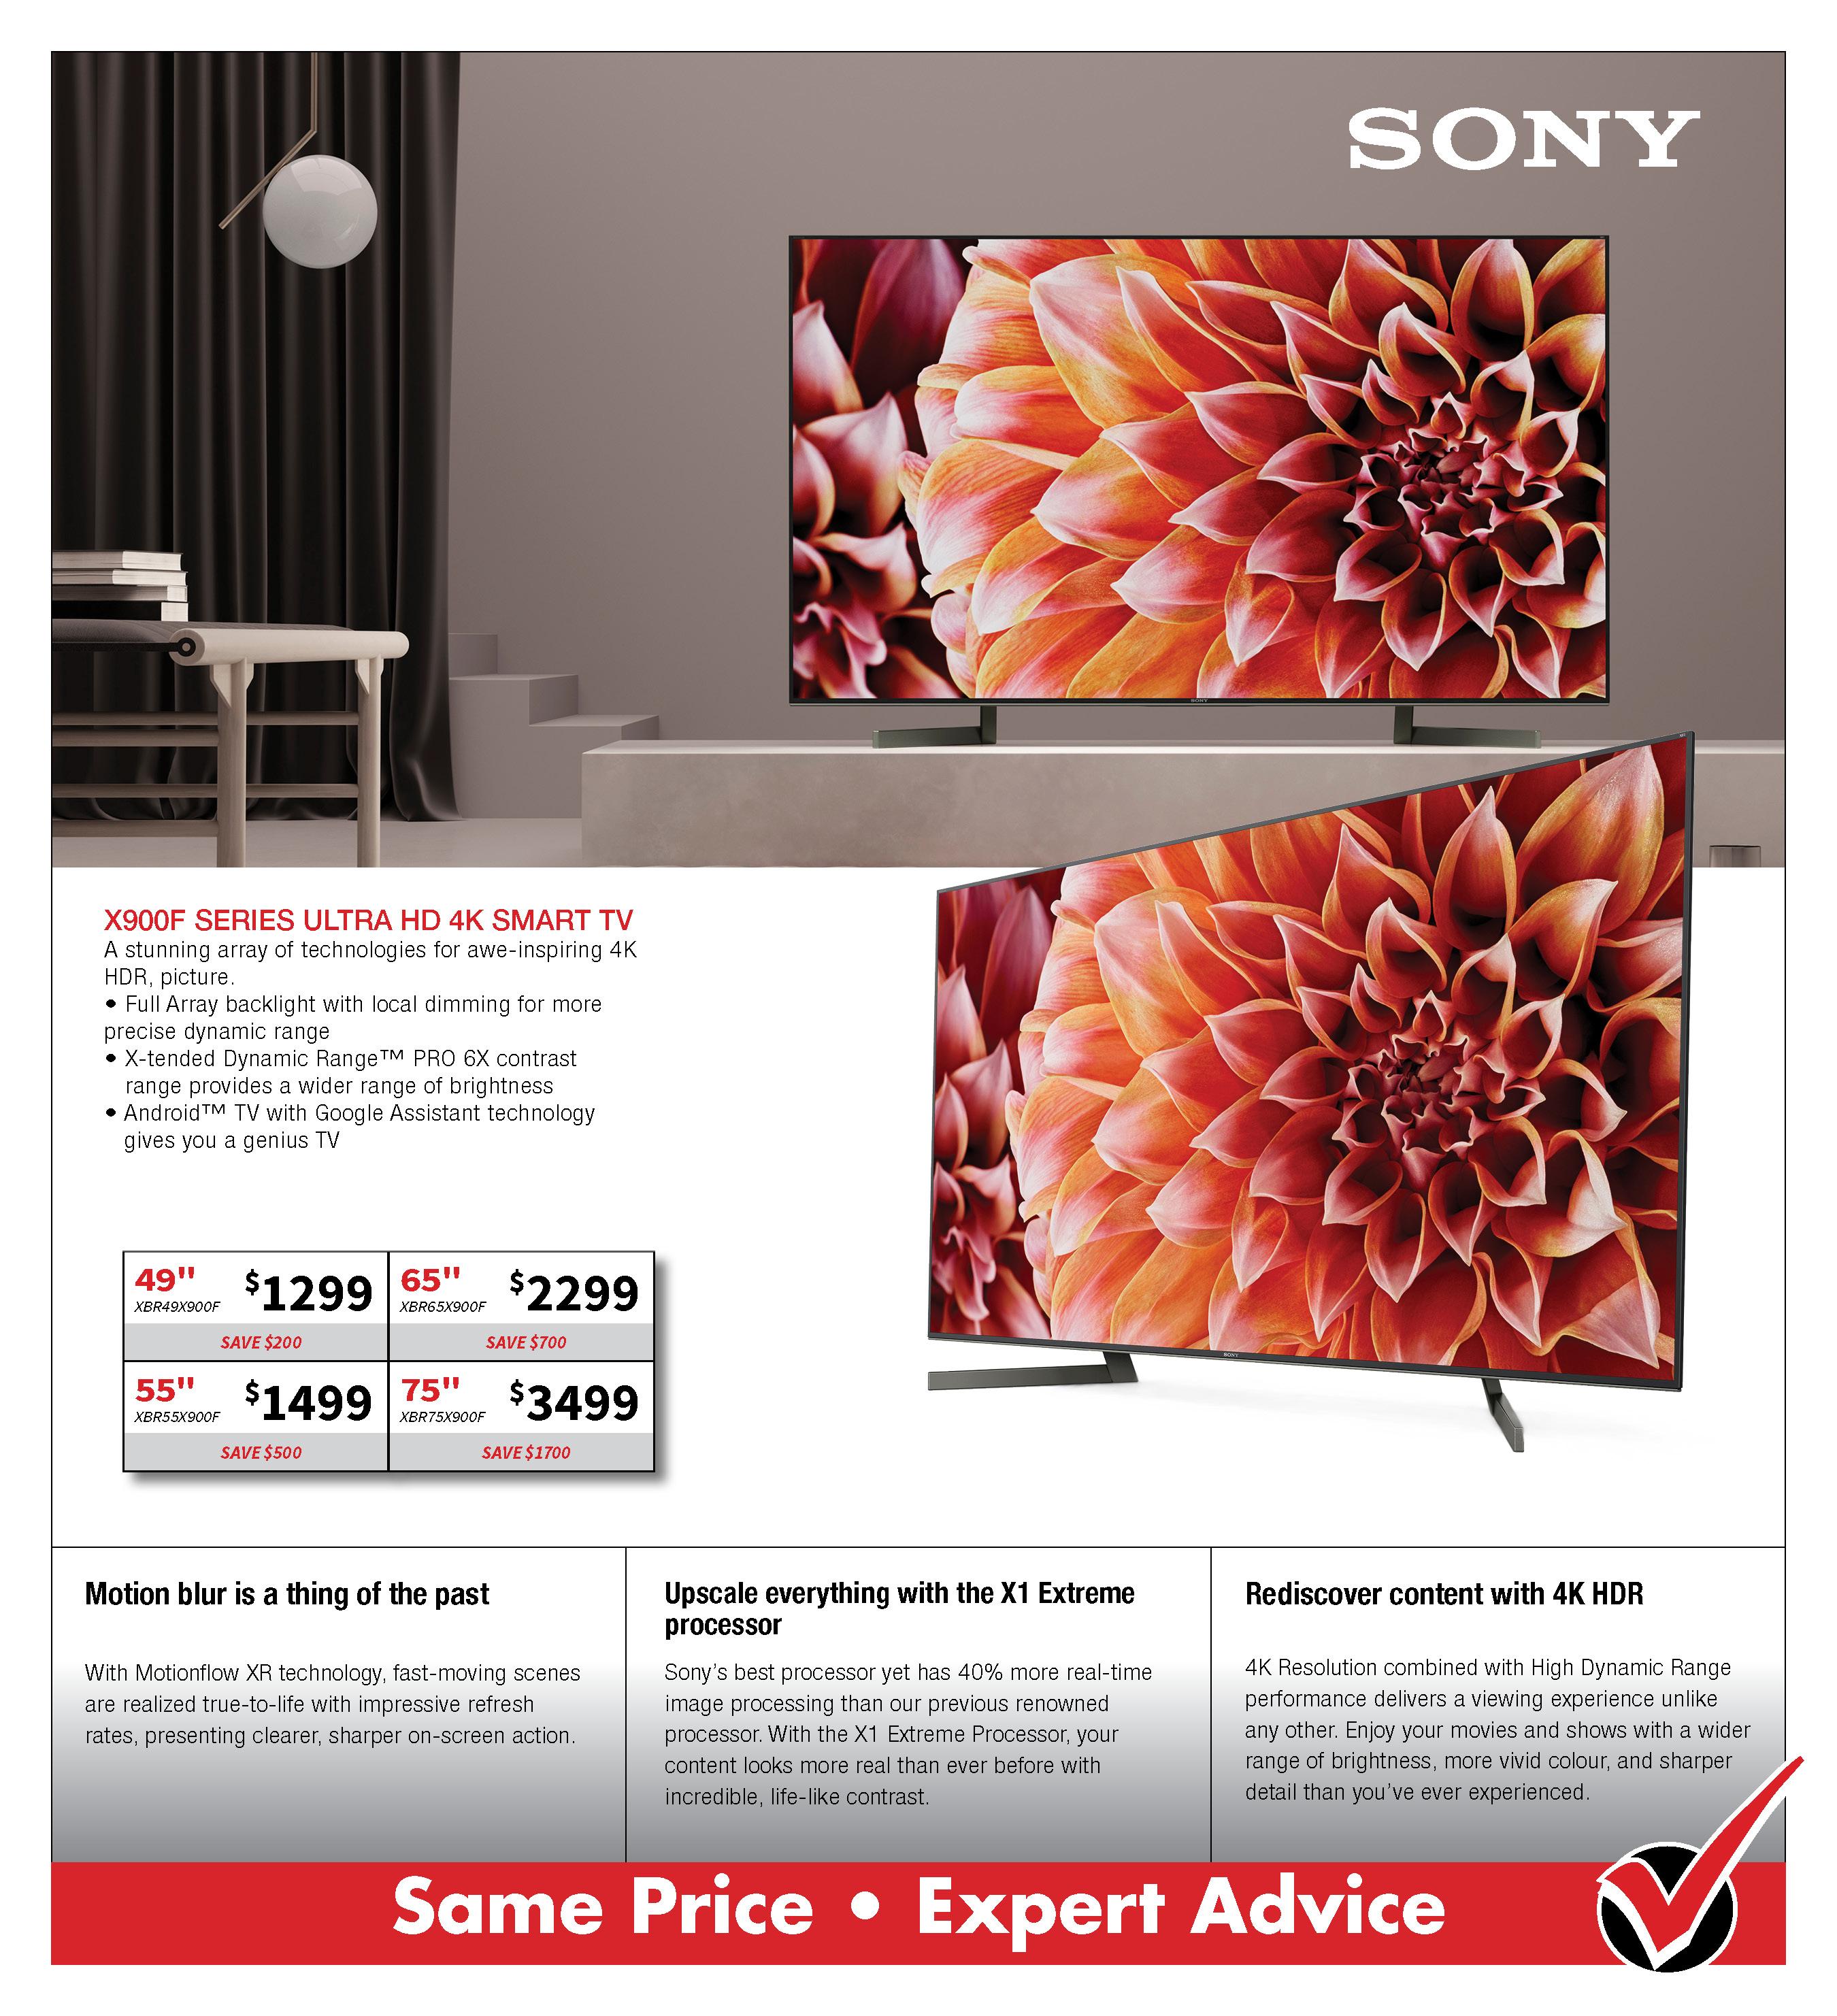 Sony X900F UHD 4K TV